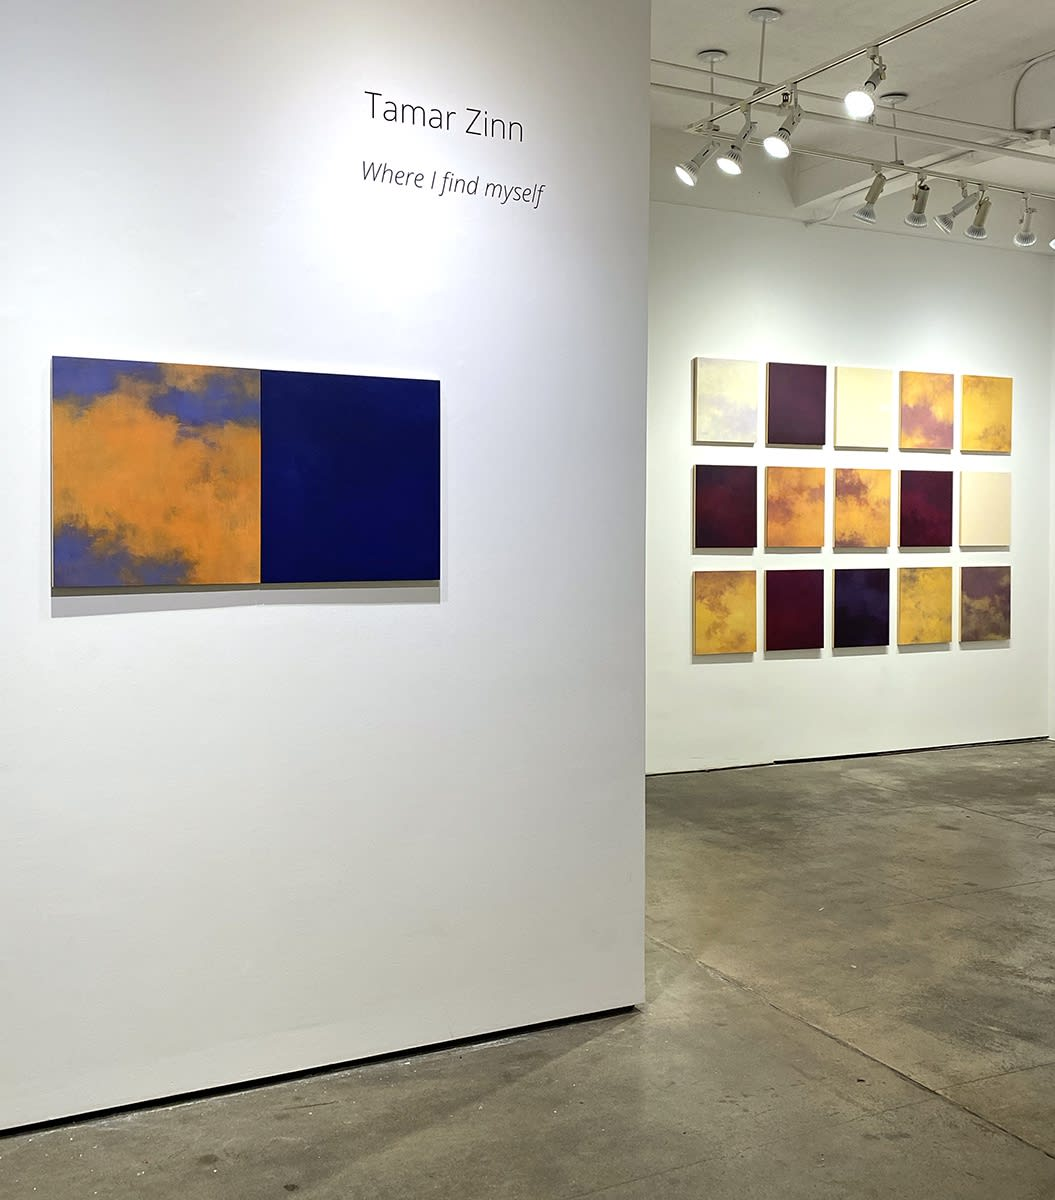 Tamar Zinn